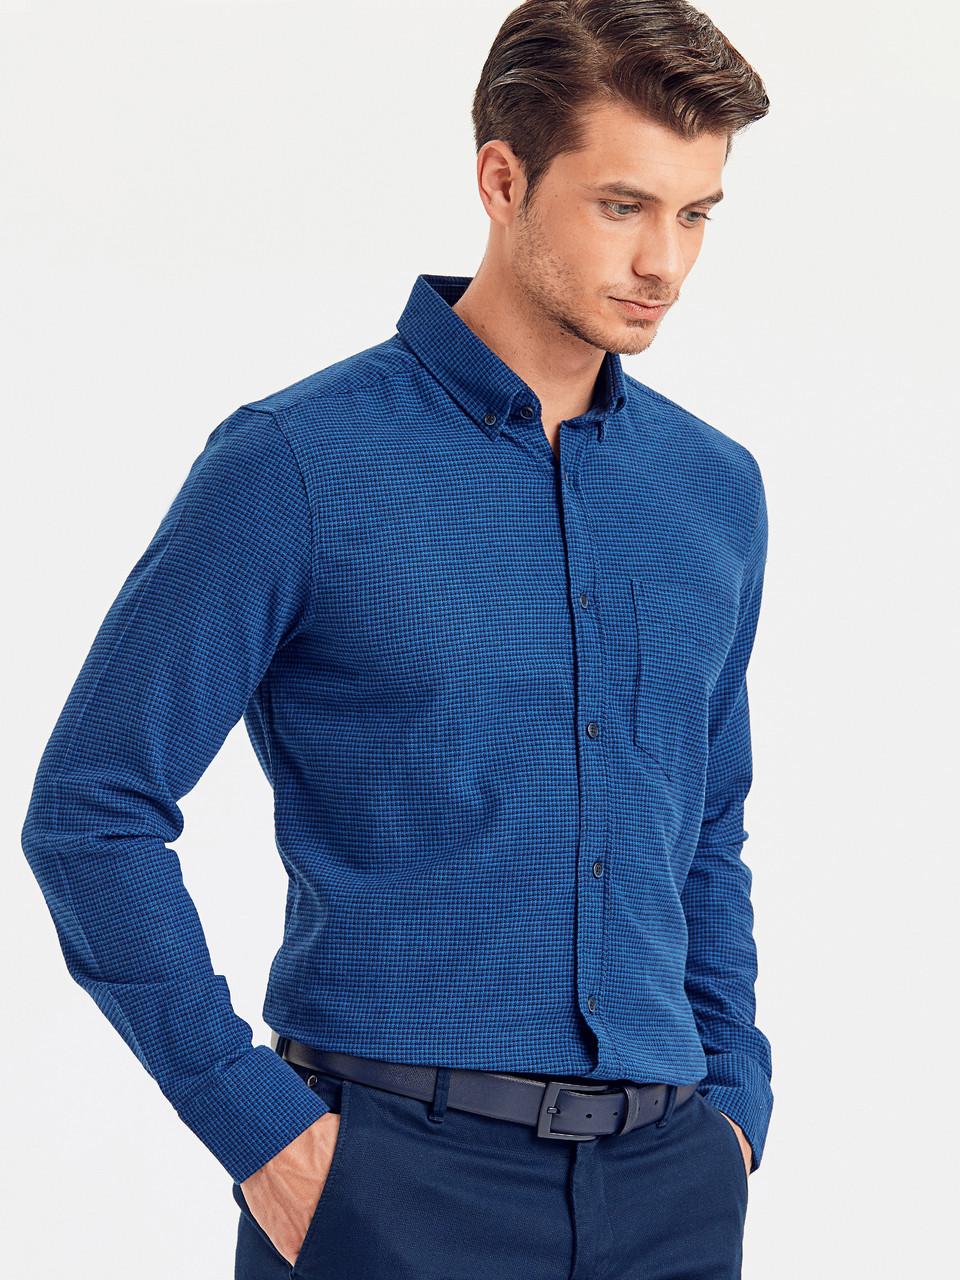 Байковая мужская рубашка LC Waikiki / ЛС Вайкики синяя с карманом на груди, в клетку